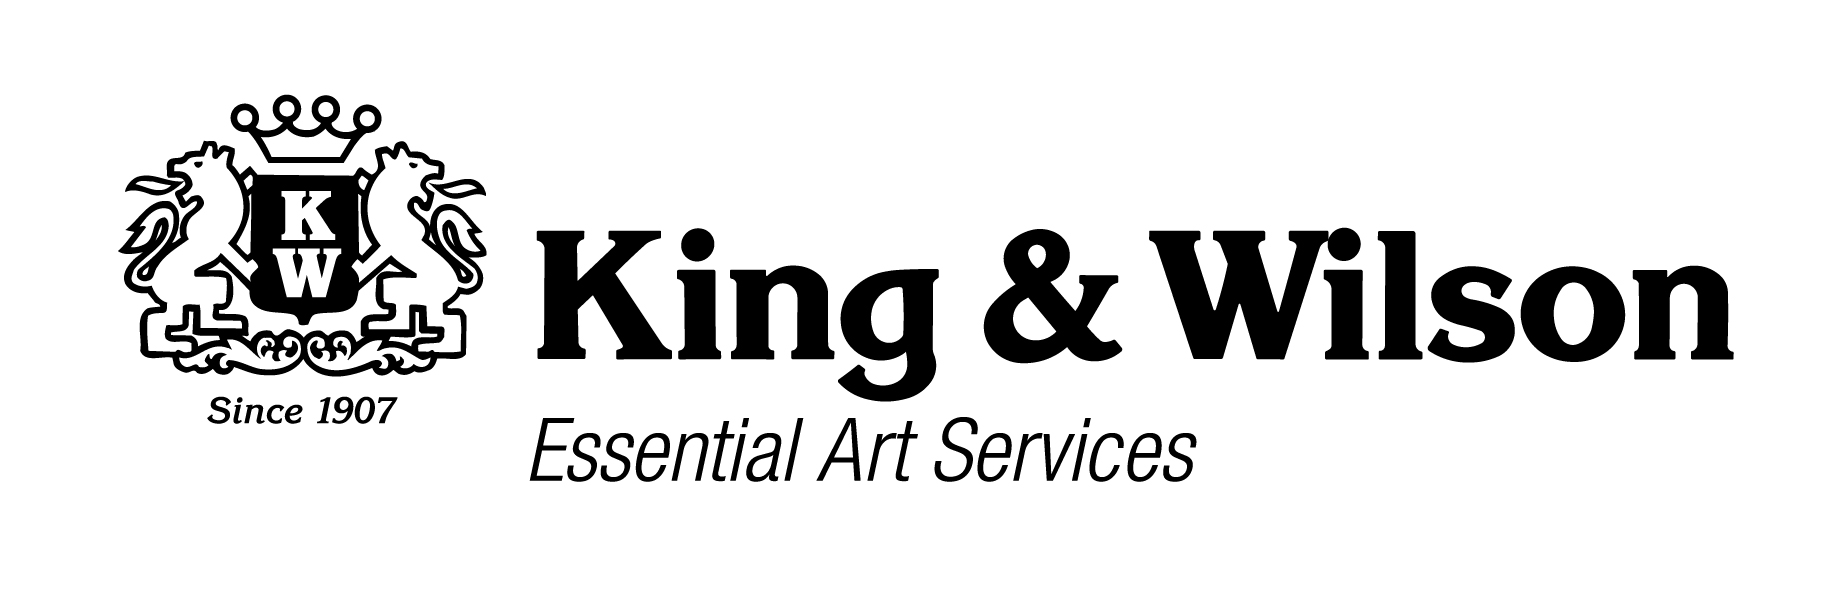 K&W Essential Art Services BW (1)